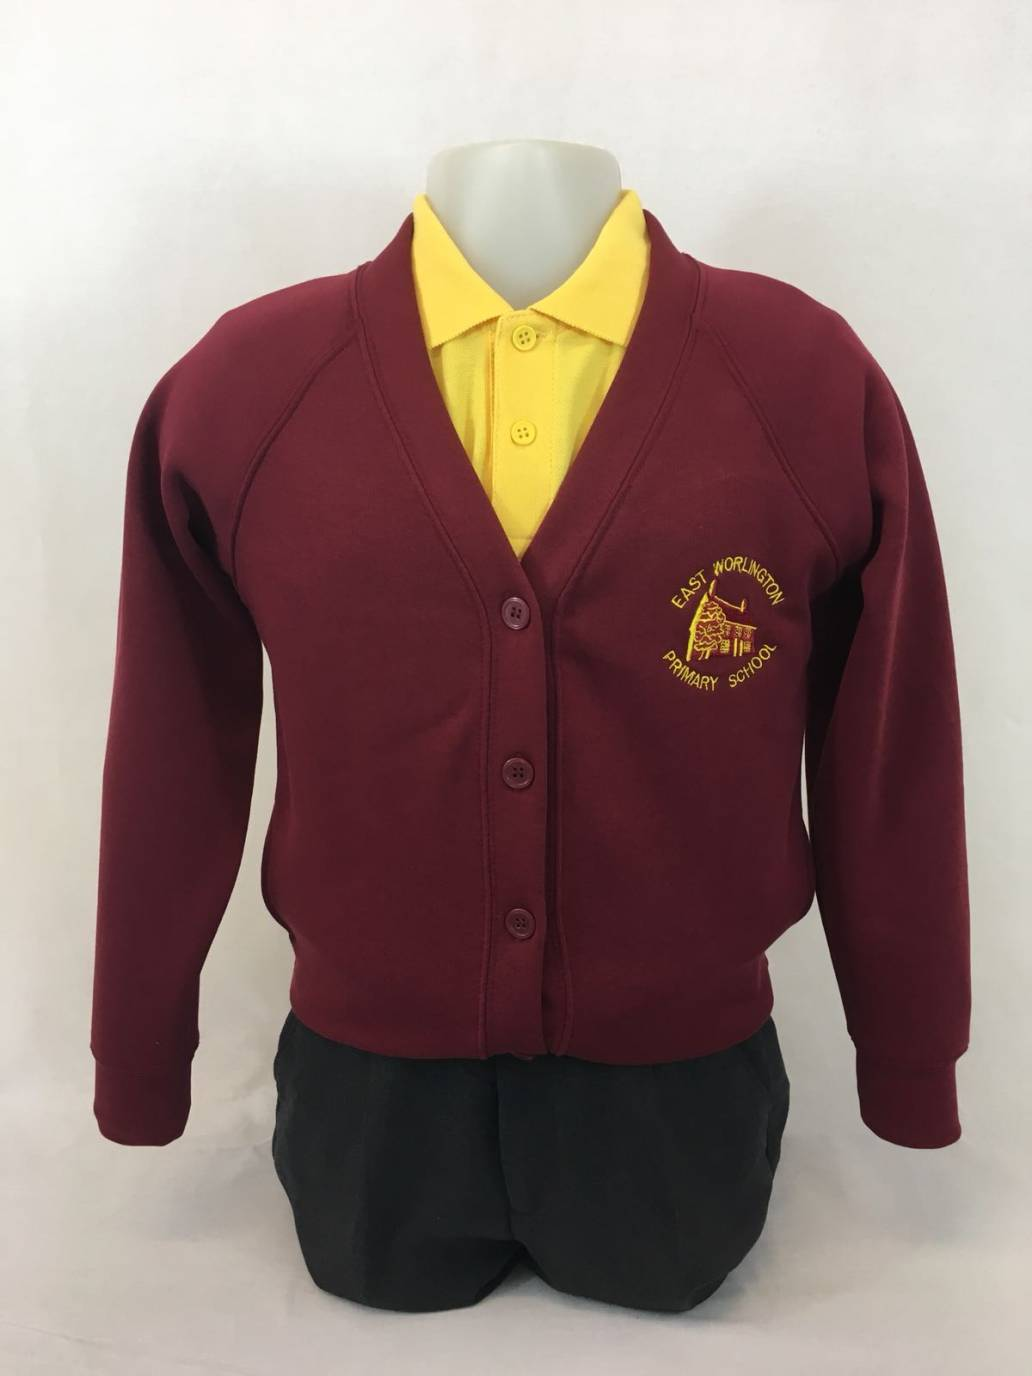 East Worlington Primary School Cardigan